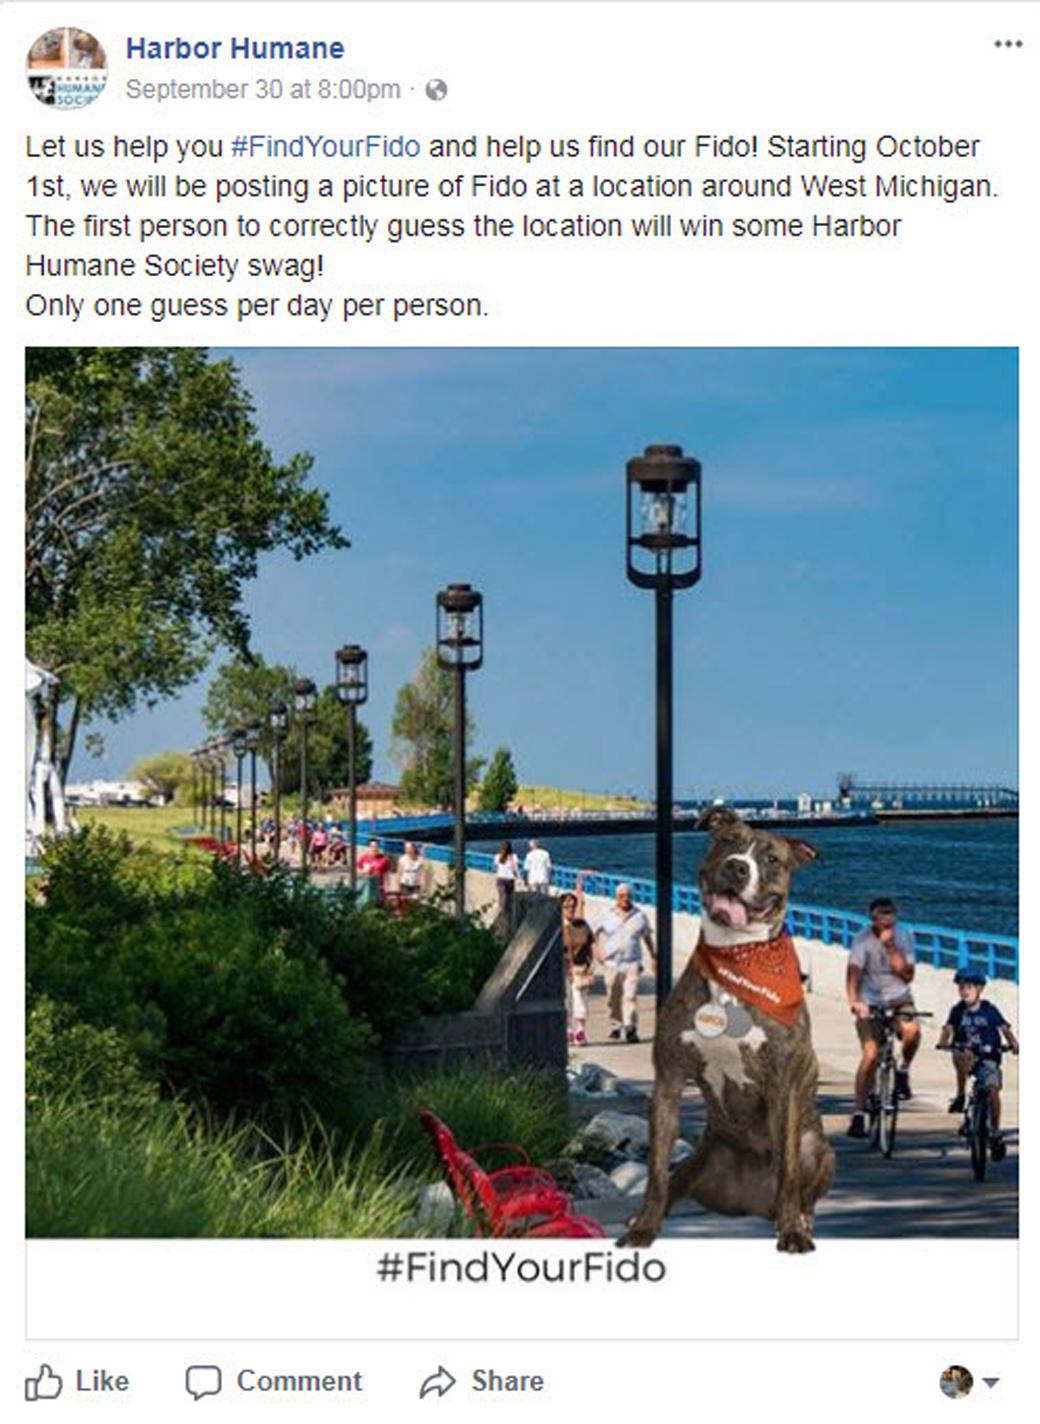 Harbor Humane #FindYourFido facebook post